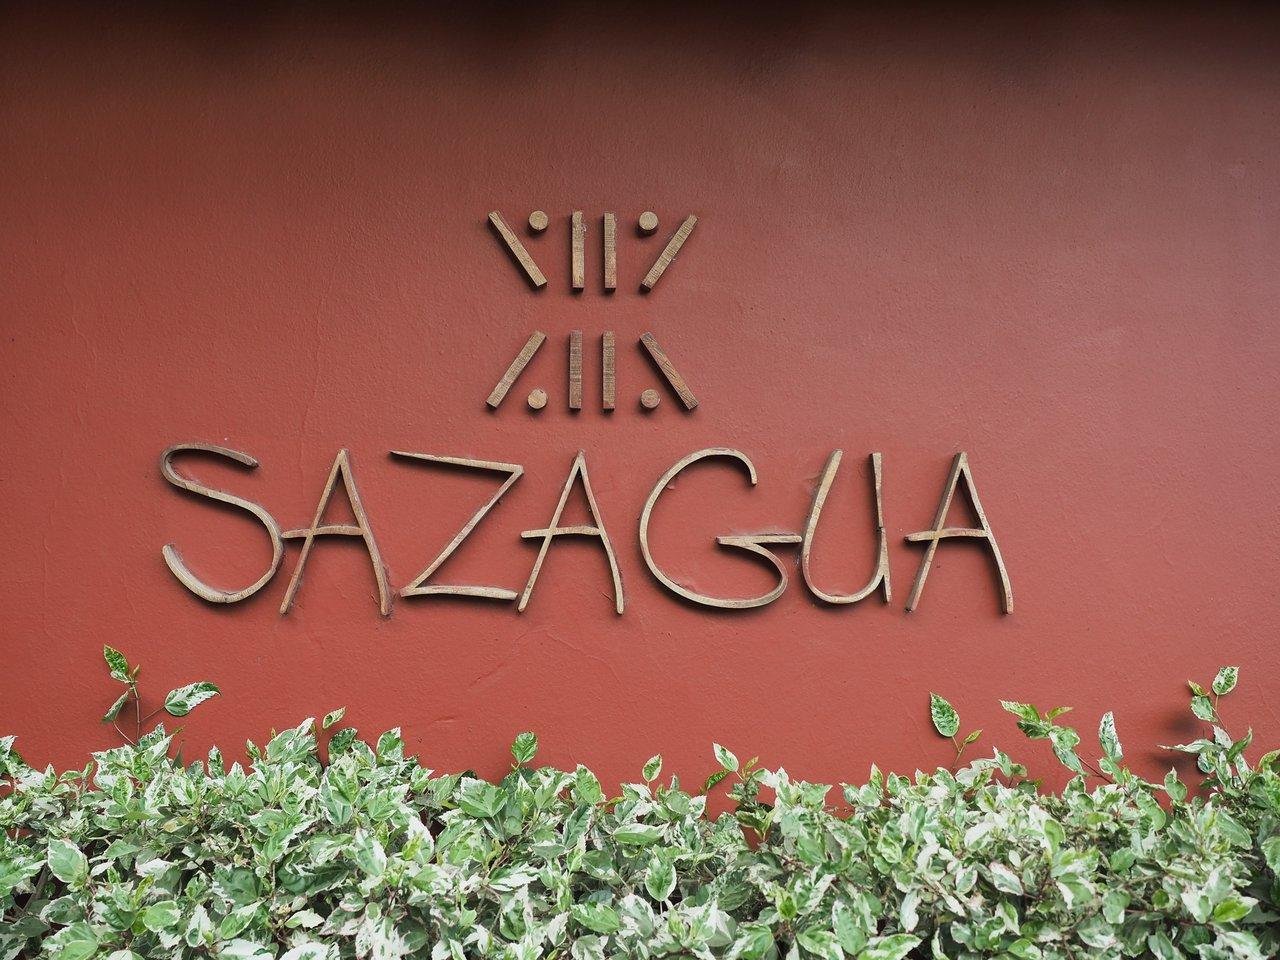 Sazagua Hotel Pereira | Photo taken by Peter G